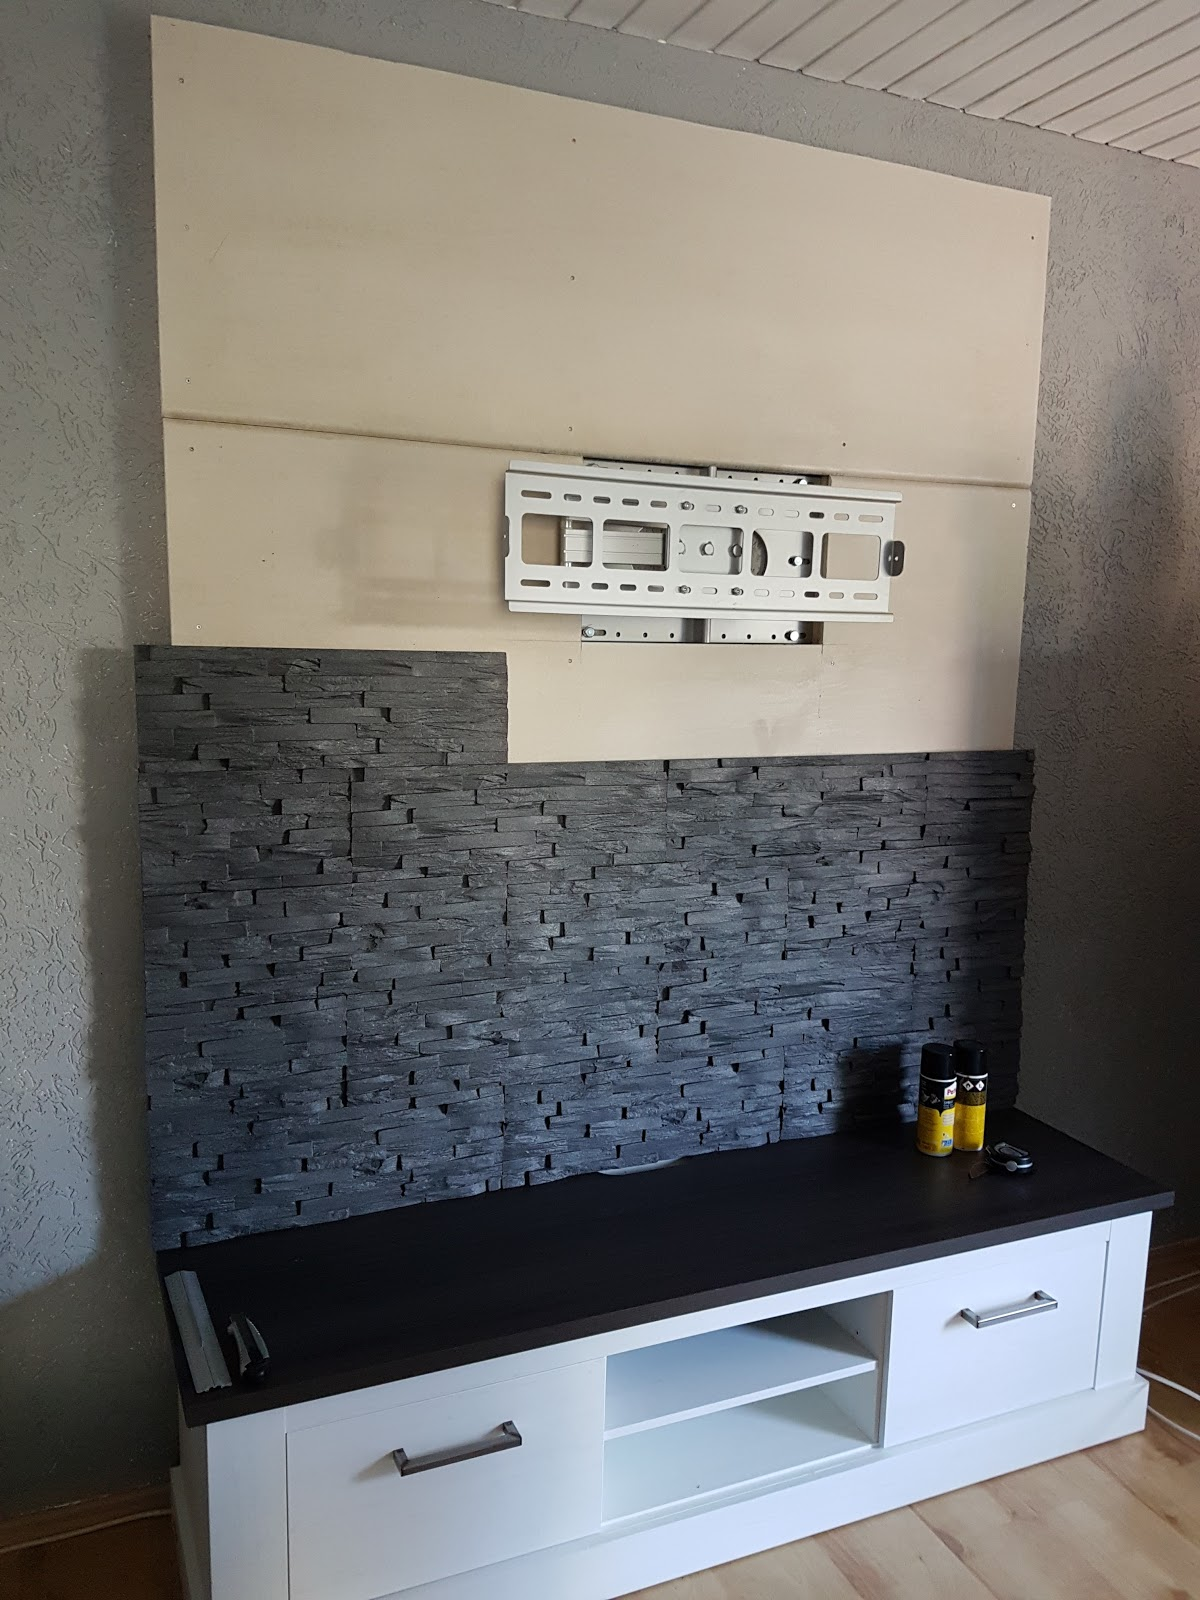 tv wand mit led beleuchtung mary 39 s kreativ blog. Black Bedroom Furniture Sets. Home Design Ideas